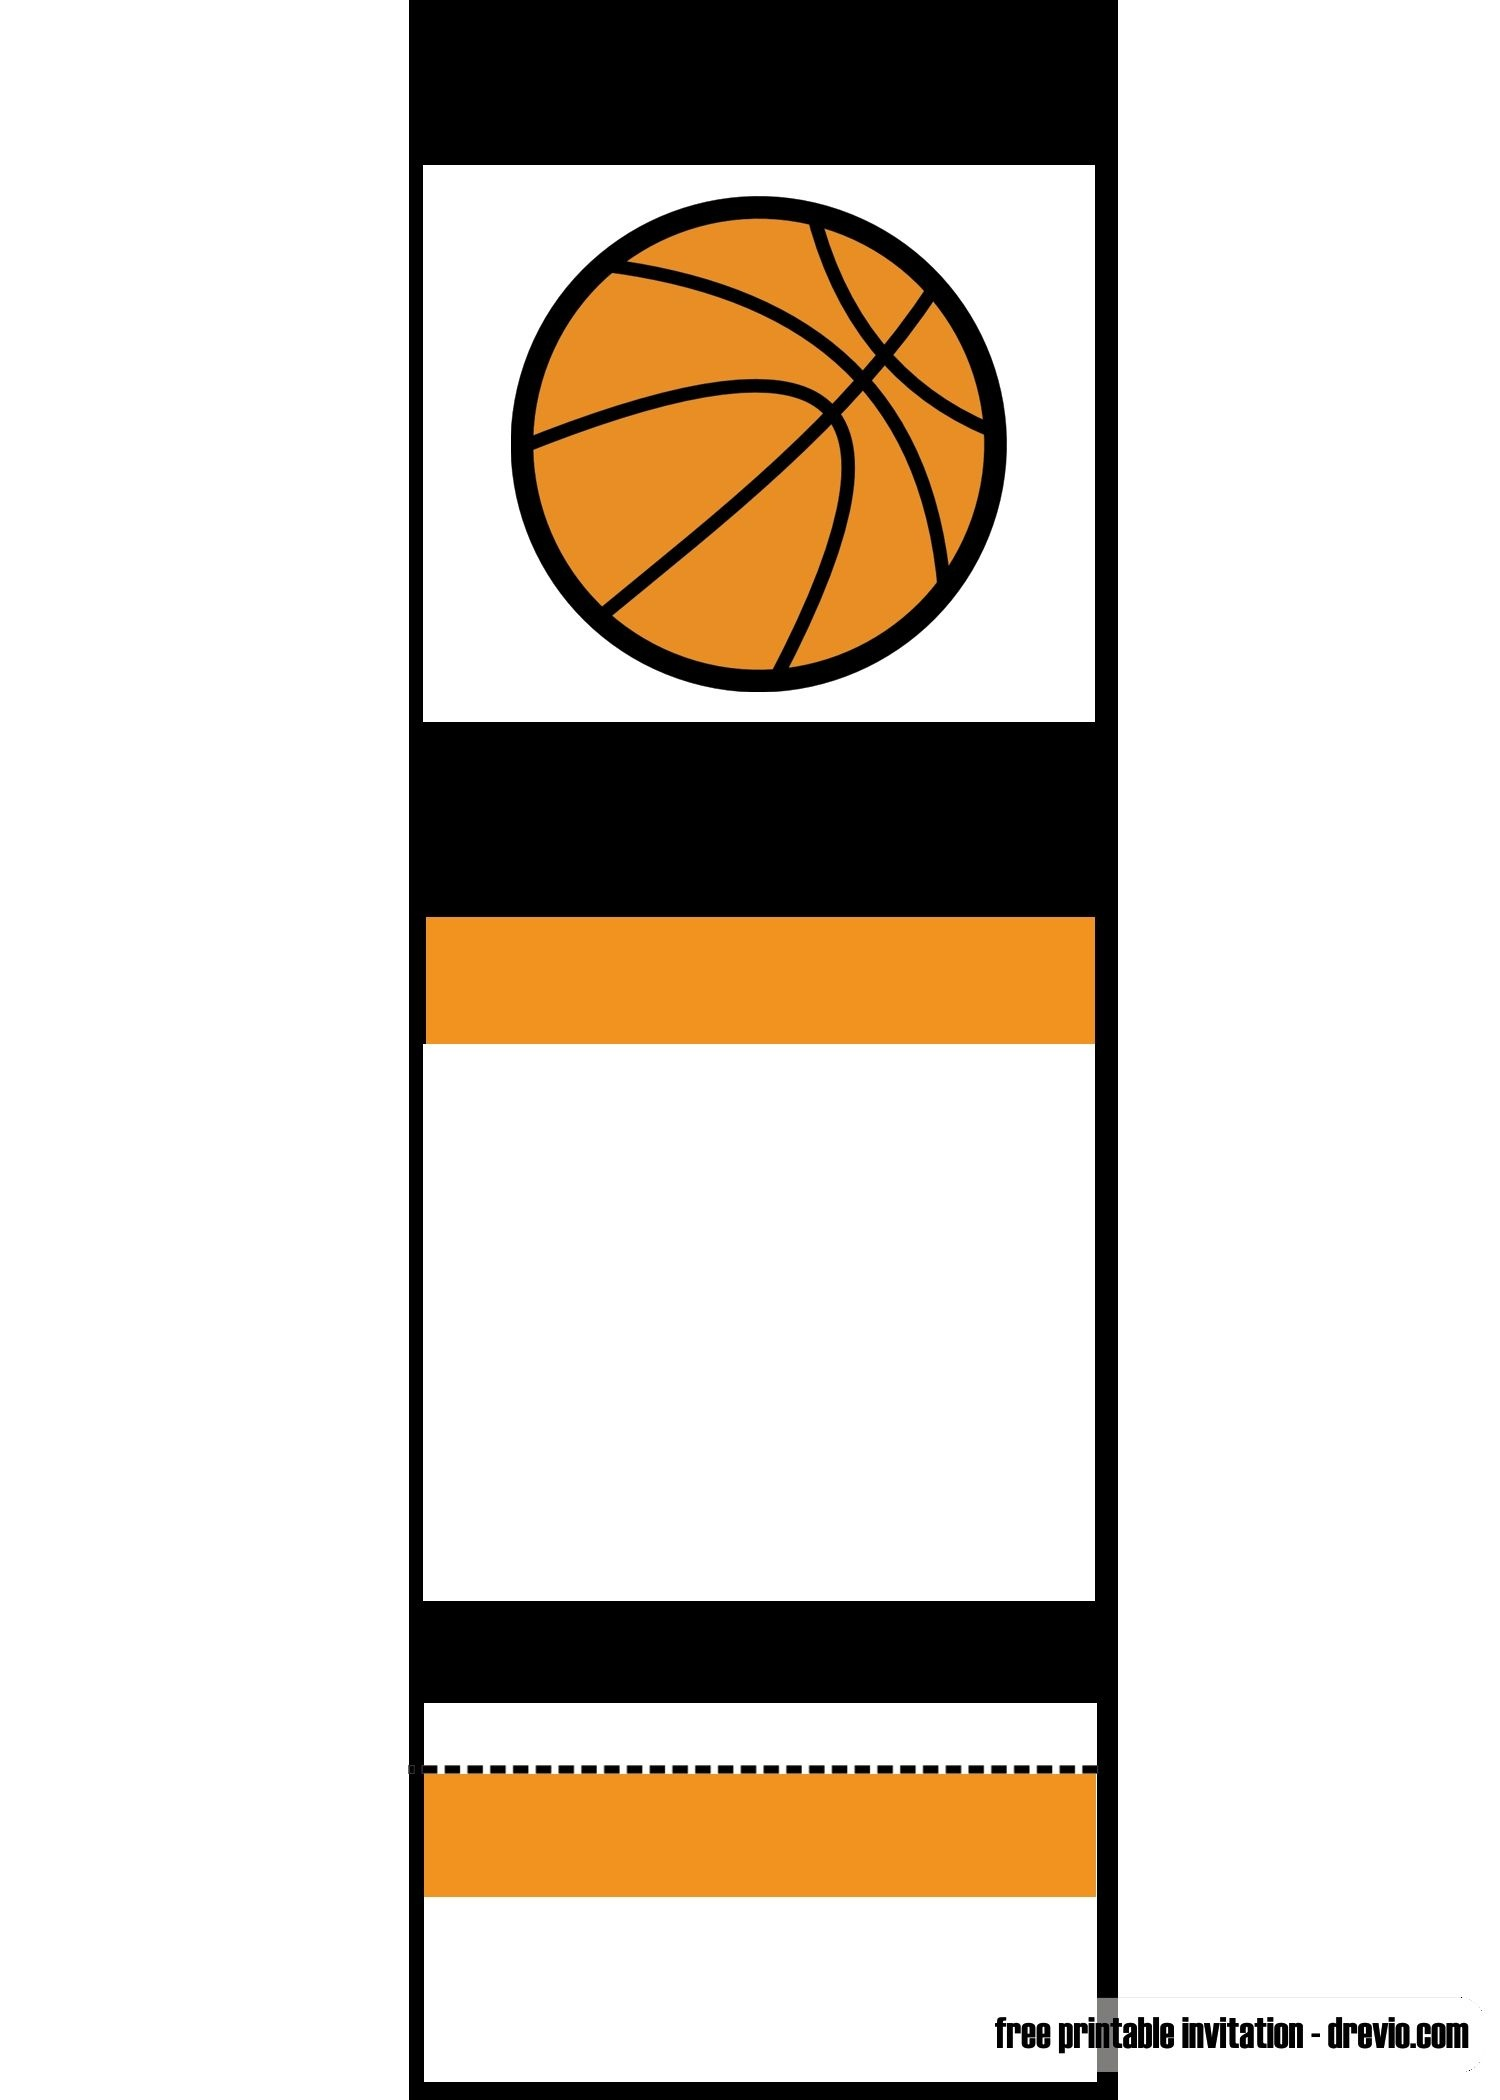 Free Printable Basketball Ticket Invitation | Unc Vs Gonzaga - Free Printable Ticket Invitations